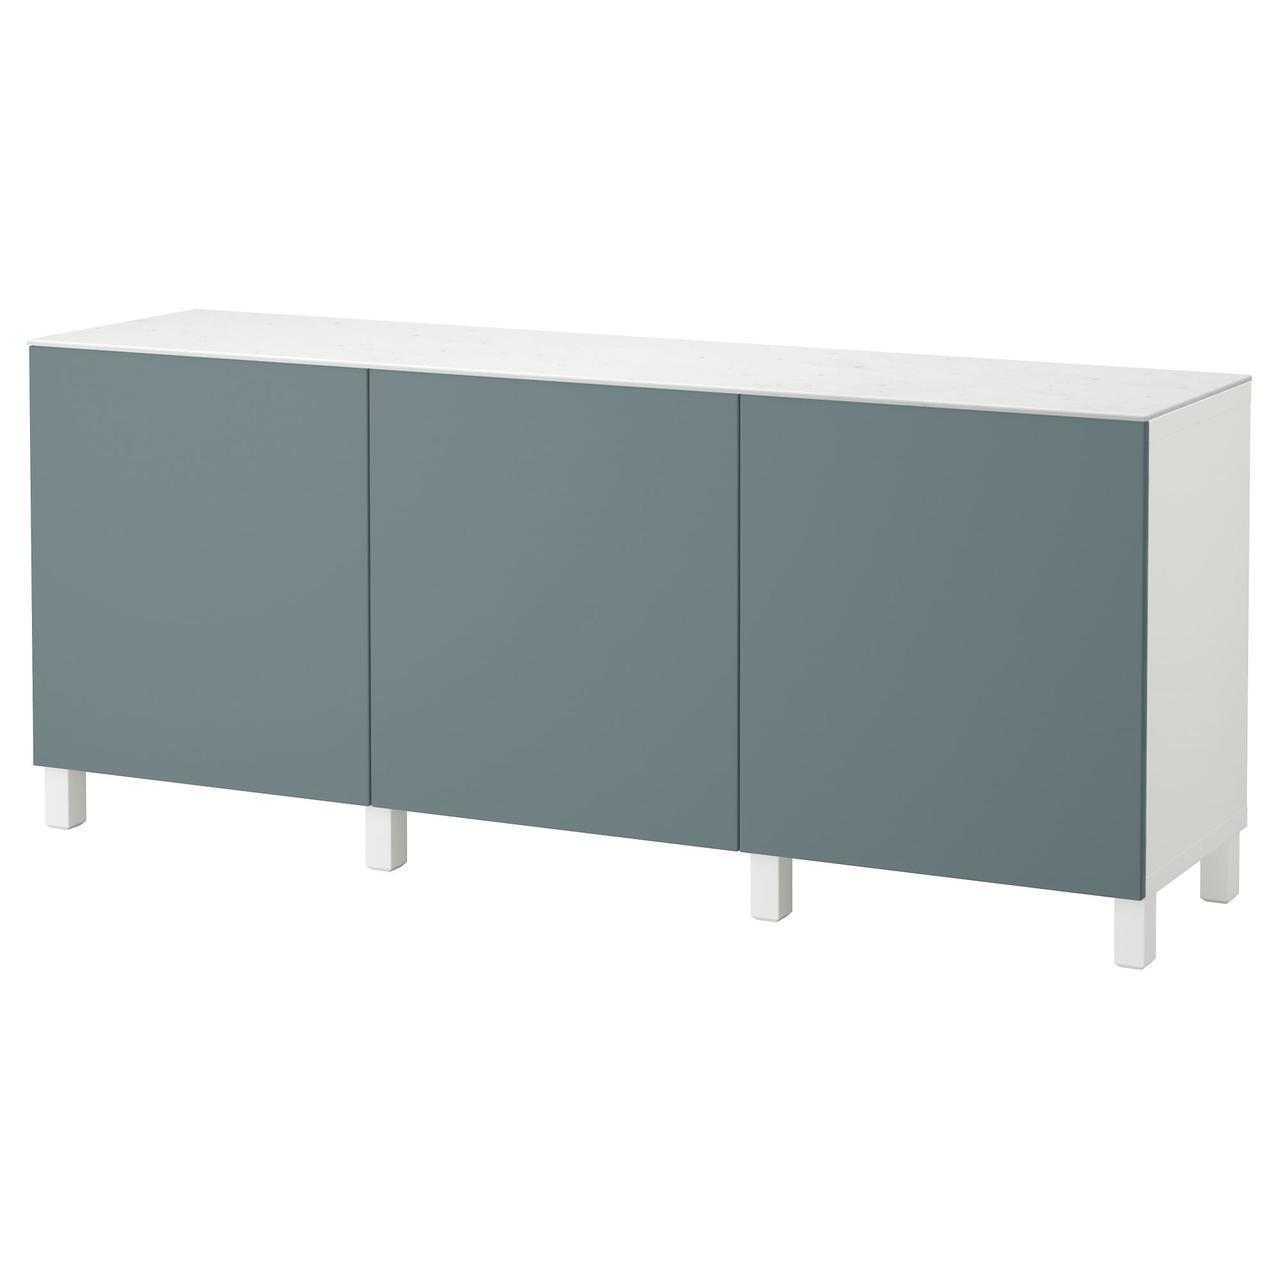 IKEA BESTA (192.097.83)Шкаф, белое, стекловолокно Glassvik